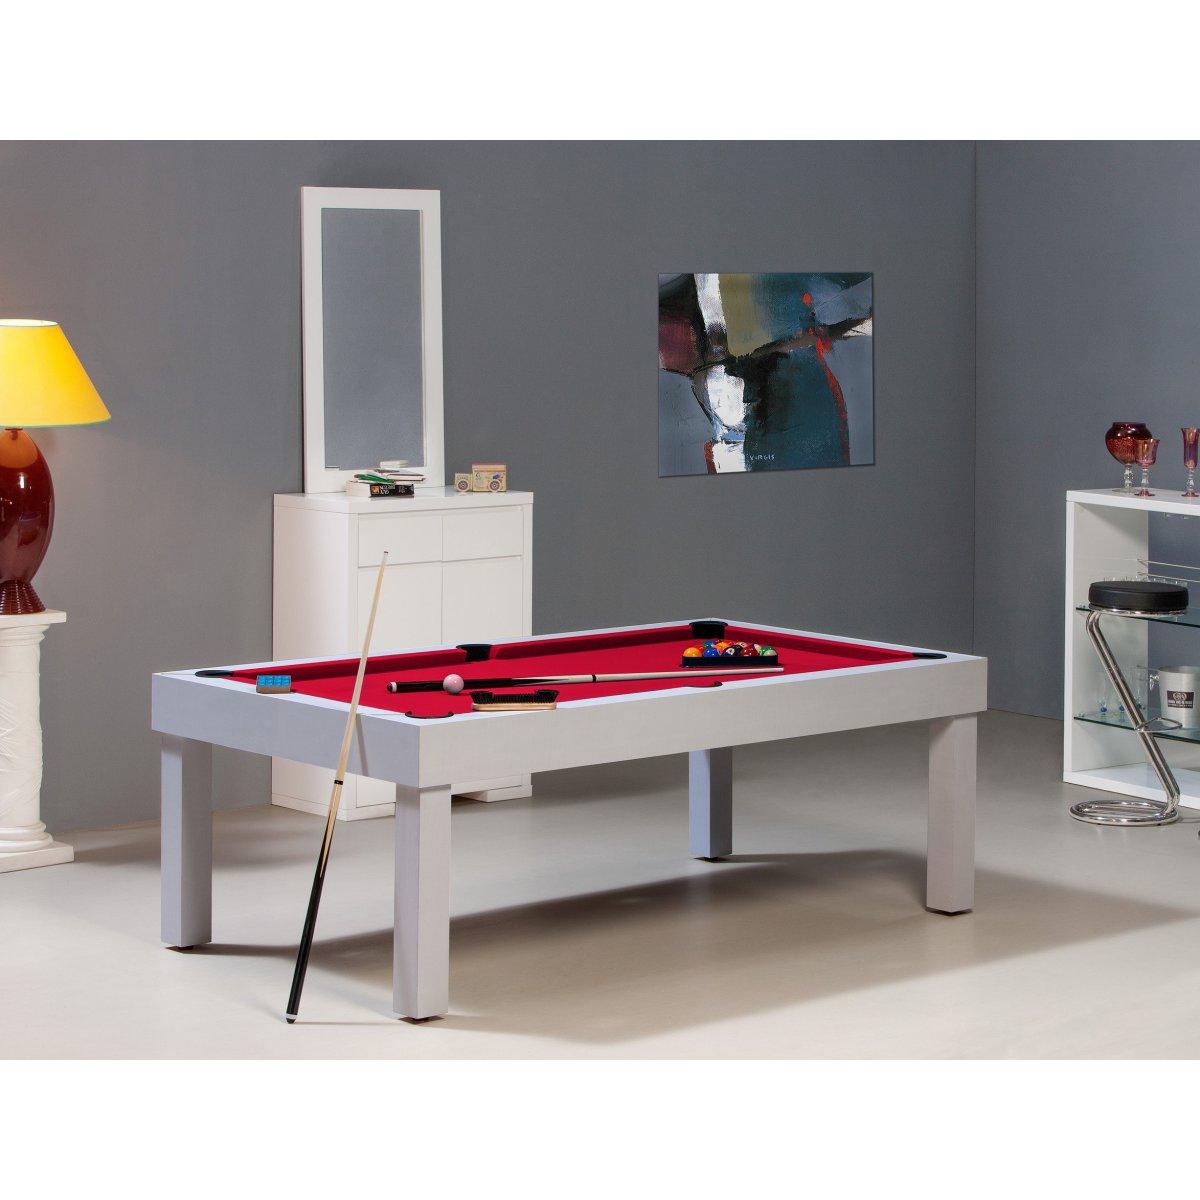 billard am ricain us et billard pool avec table bora bora. Black Bedroom Furniture Sets. Home Design Ideas